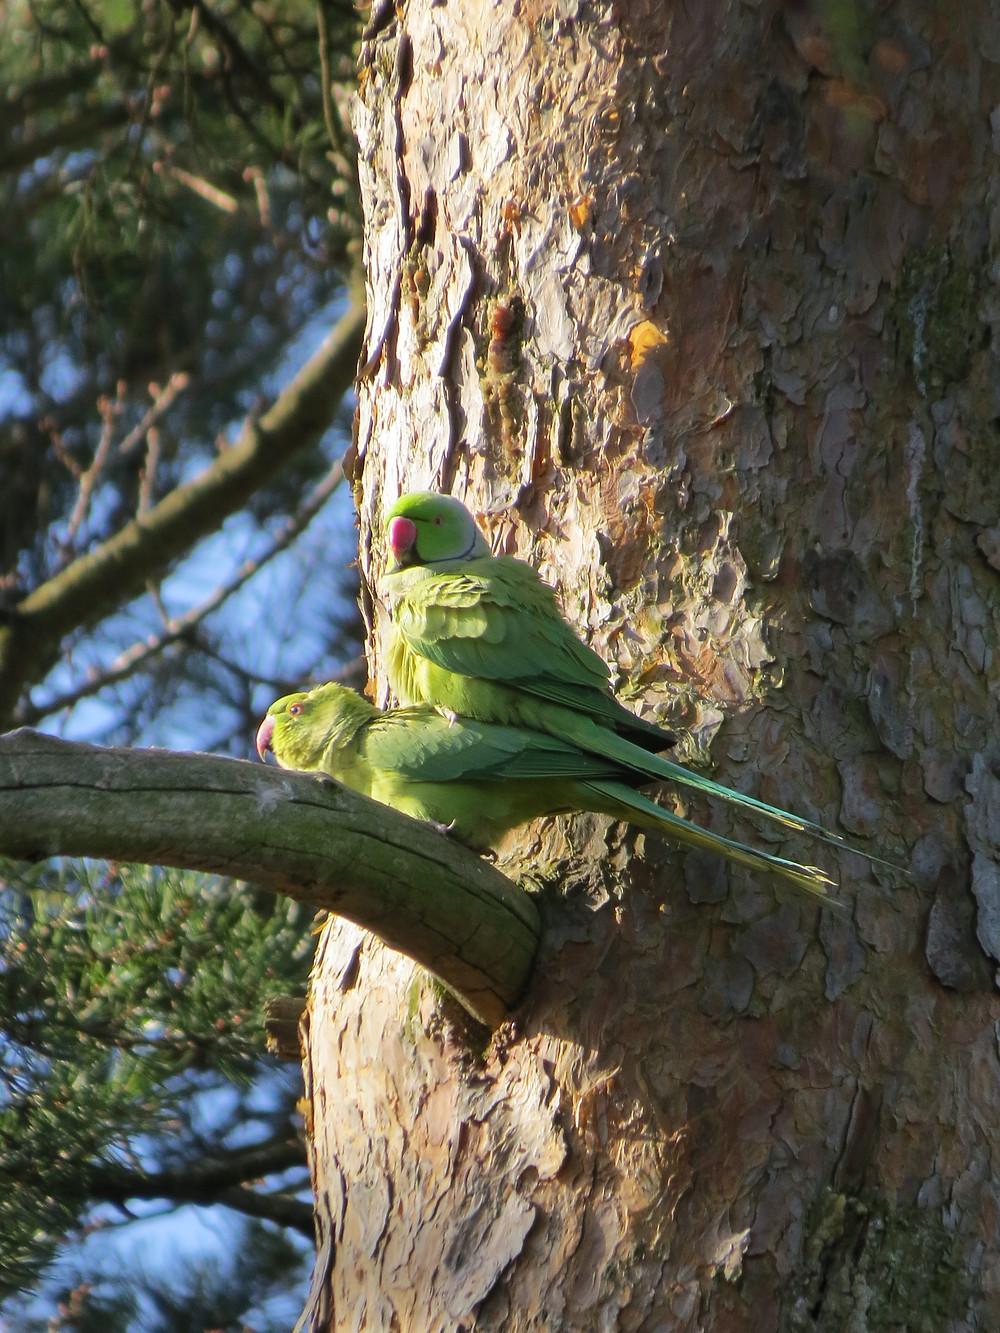 Parakeet breeding in Highbury Park, Birmingham. Photo: Barbara Copperthwaite, Go Be Wild